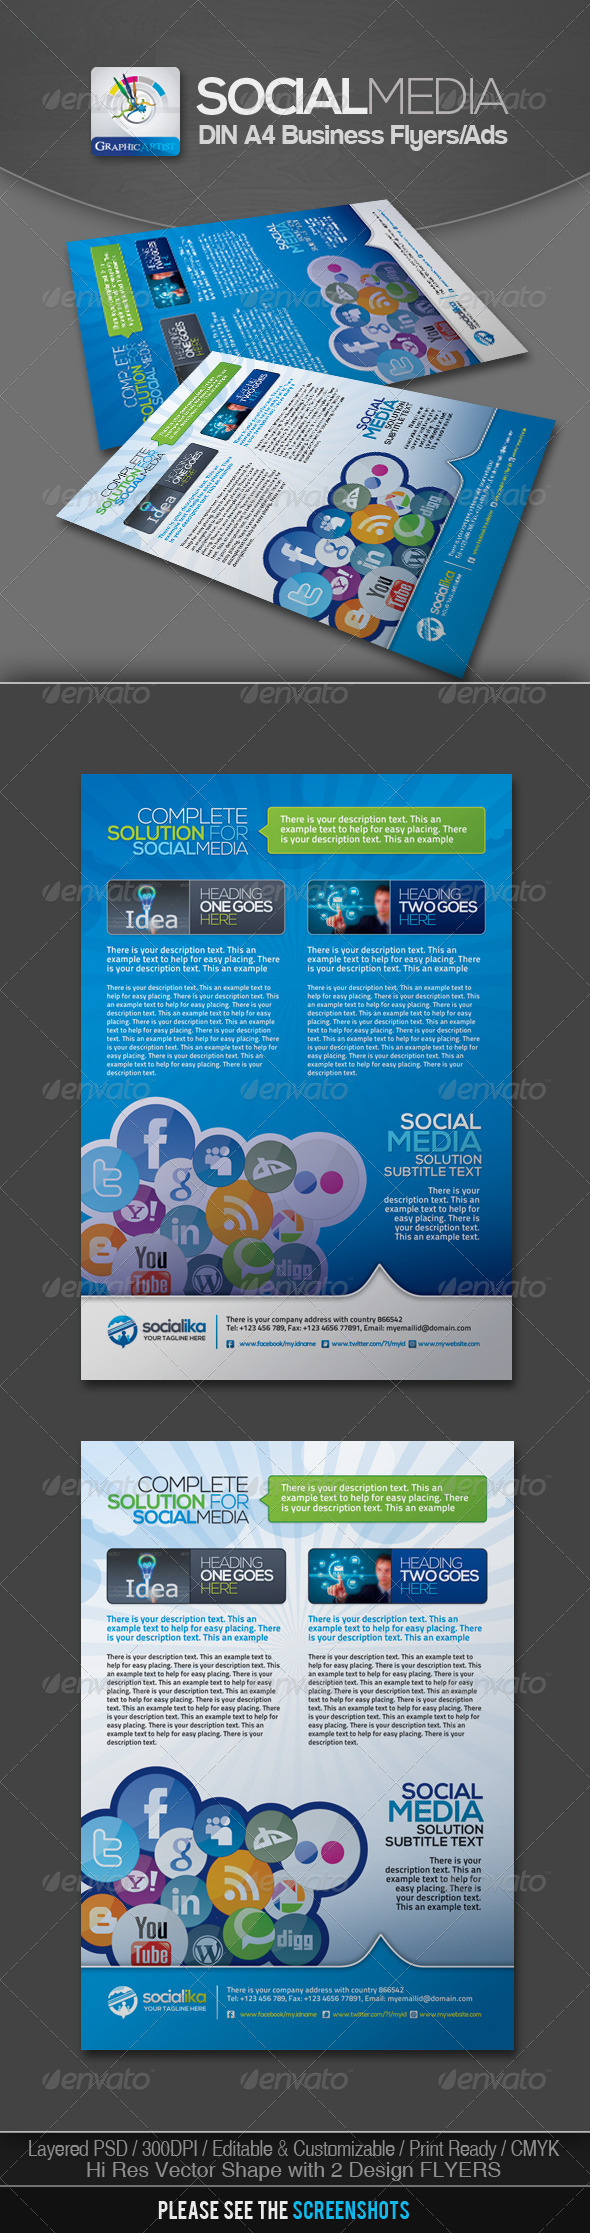 GraphicRiver Social Media Business Flyers v.2 3023822